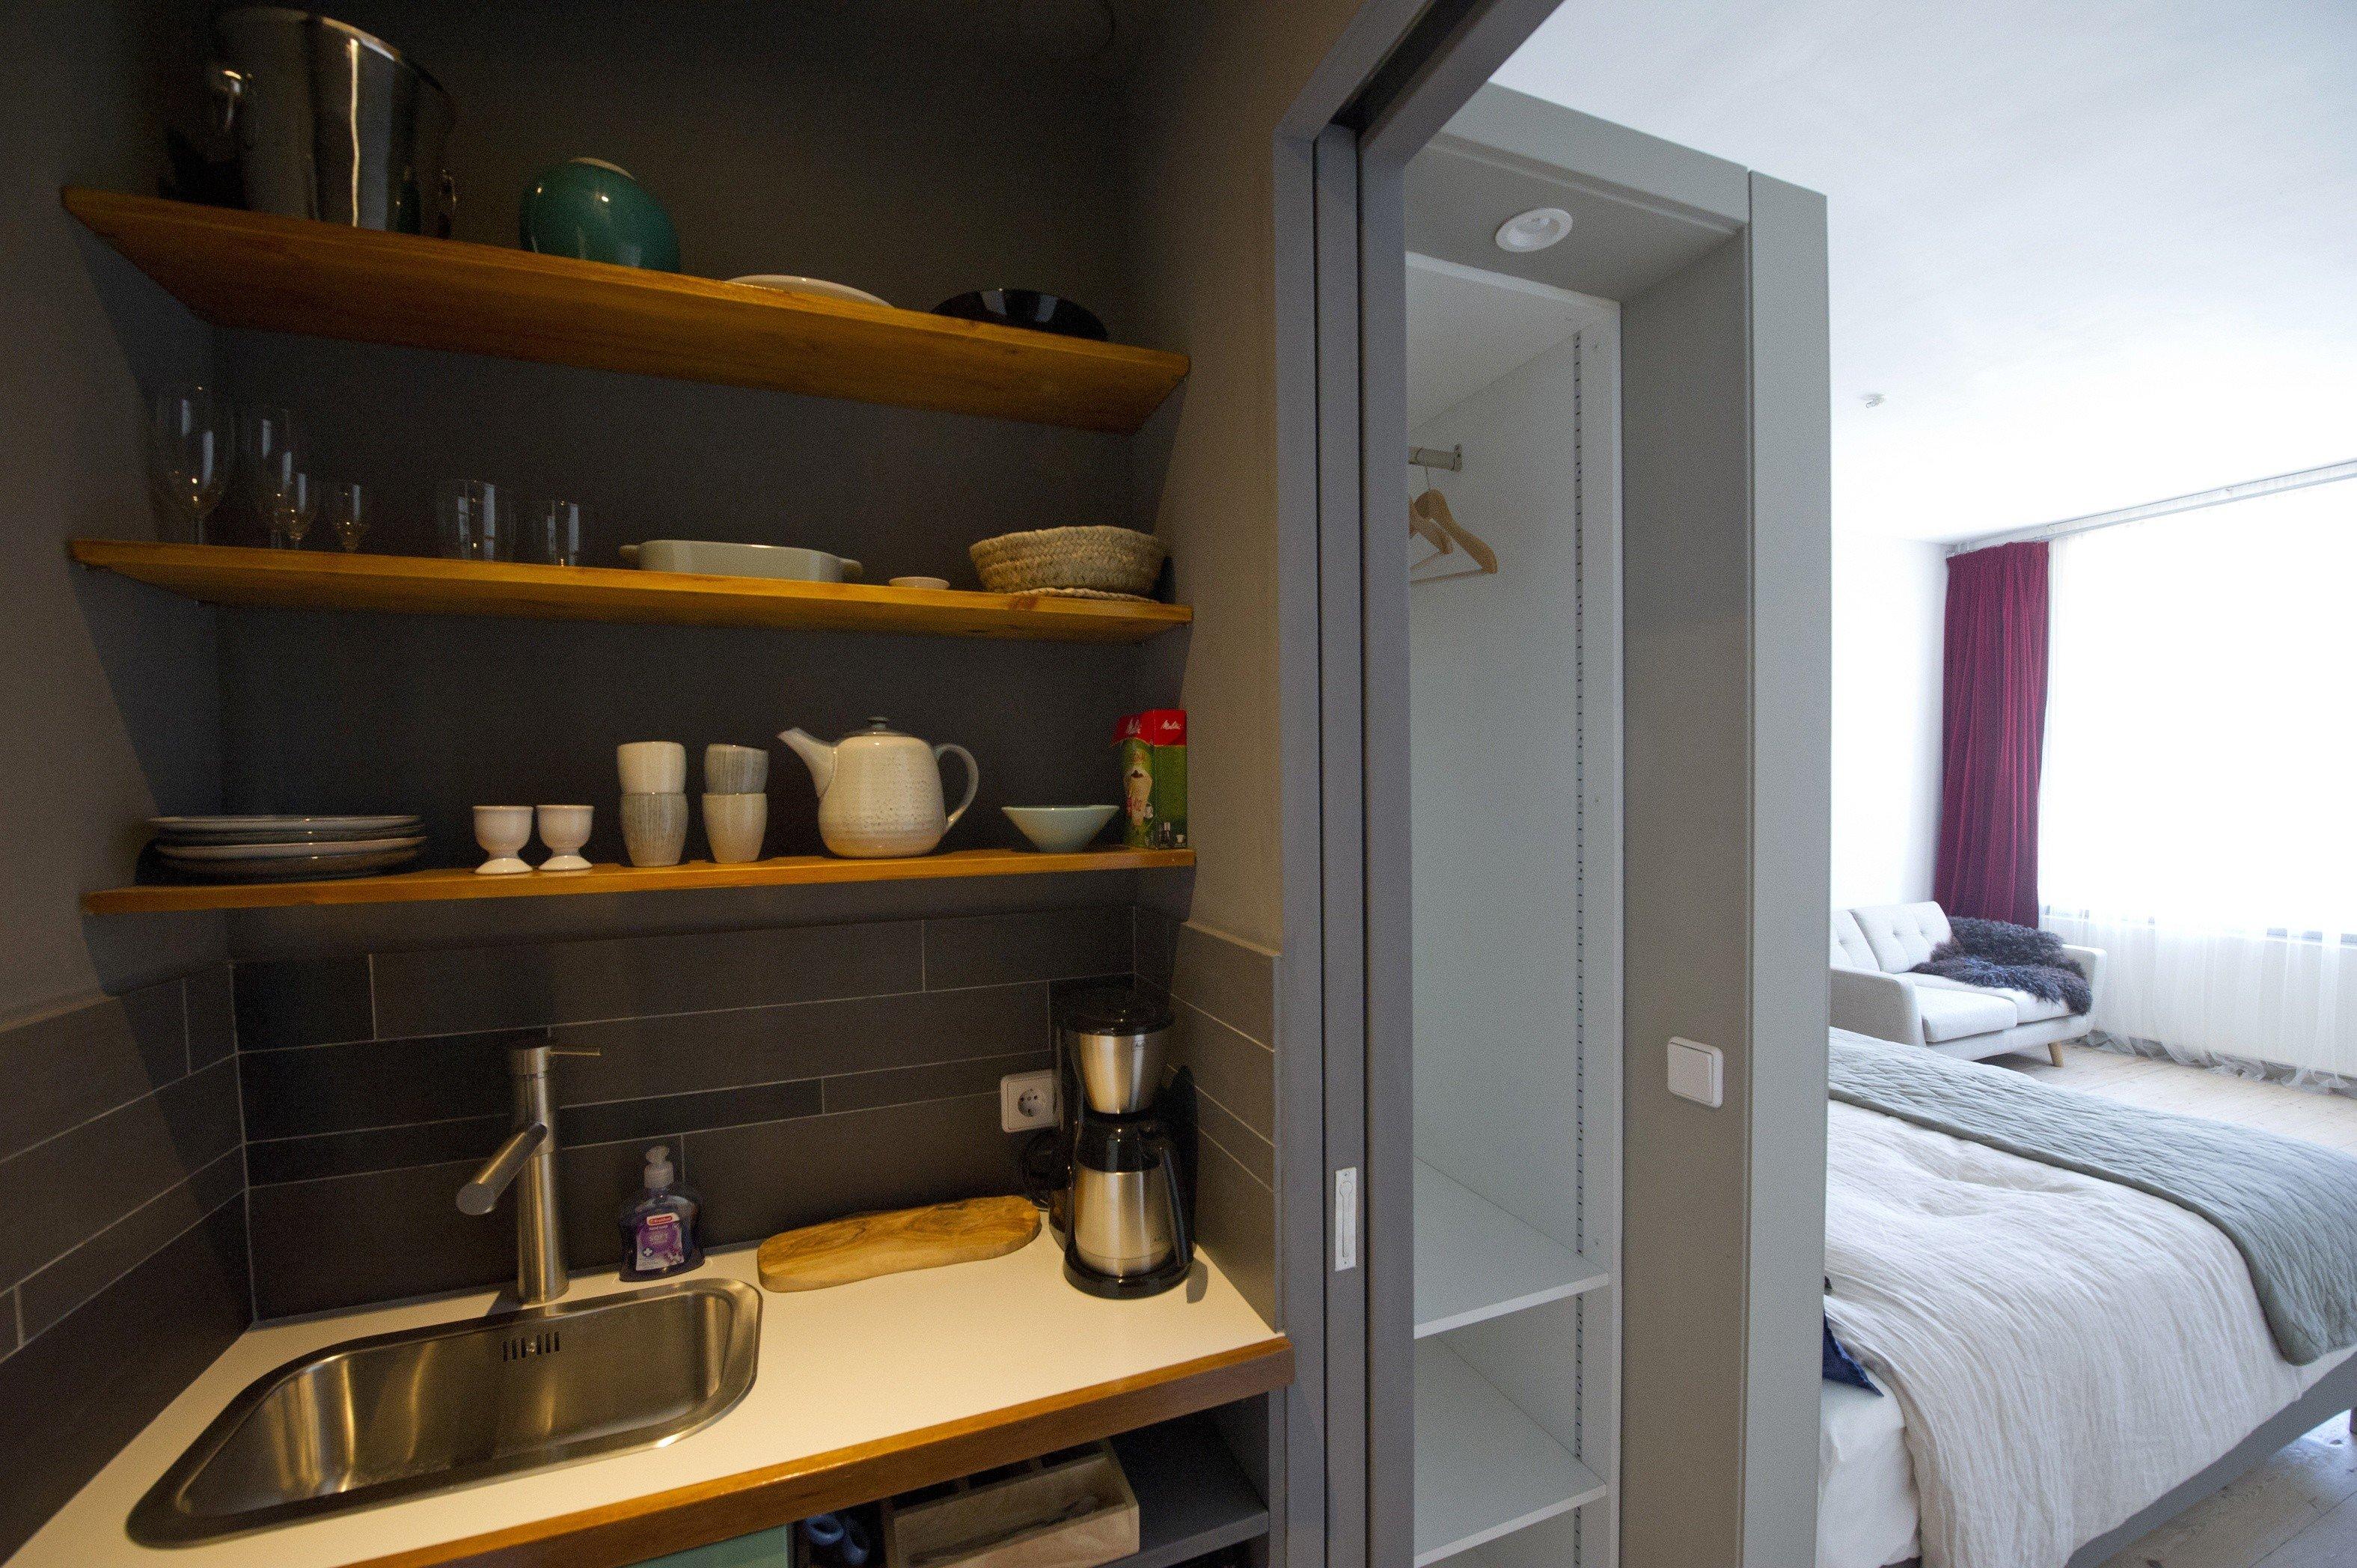 nacht aan de gracht haarlem haarlem. Black Bedroom Furniture Sets. Home Design Ideas